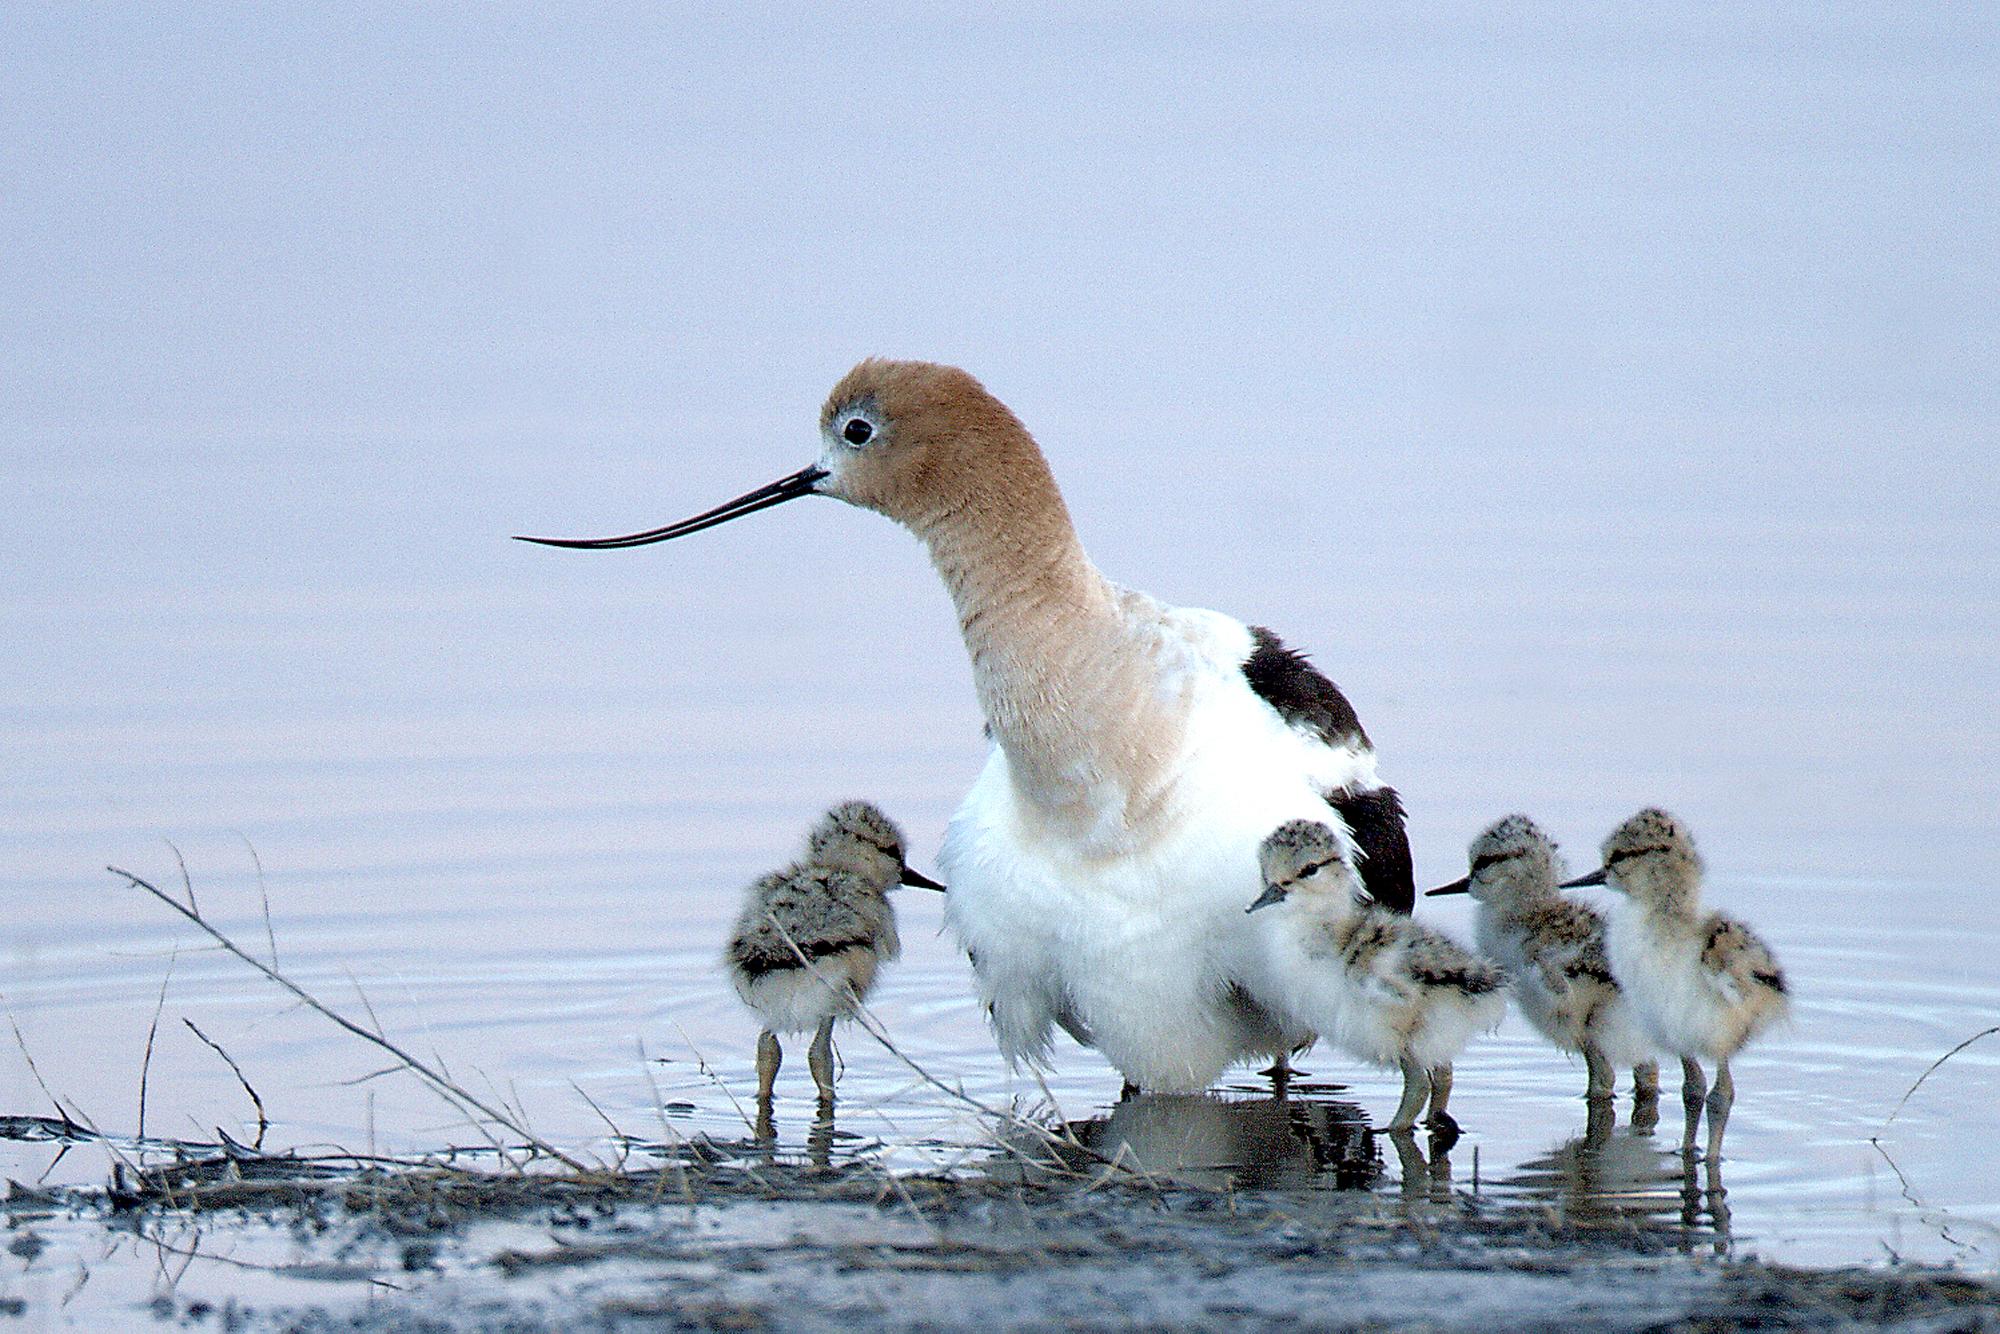 Recurvirostra_americana_-_Malheur_National_Wildlife_Refuge,_Oregon,_USA_-adult_and_chicks-8